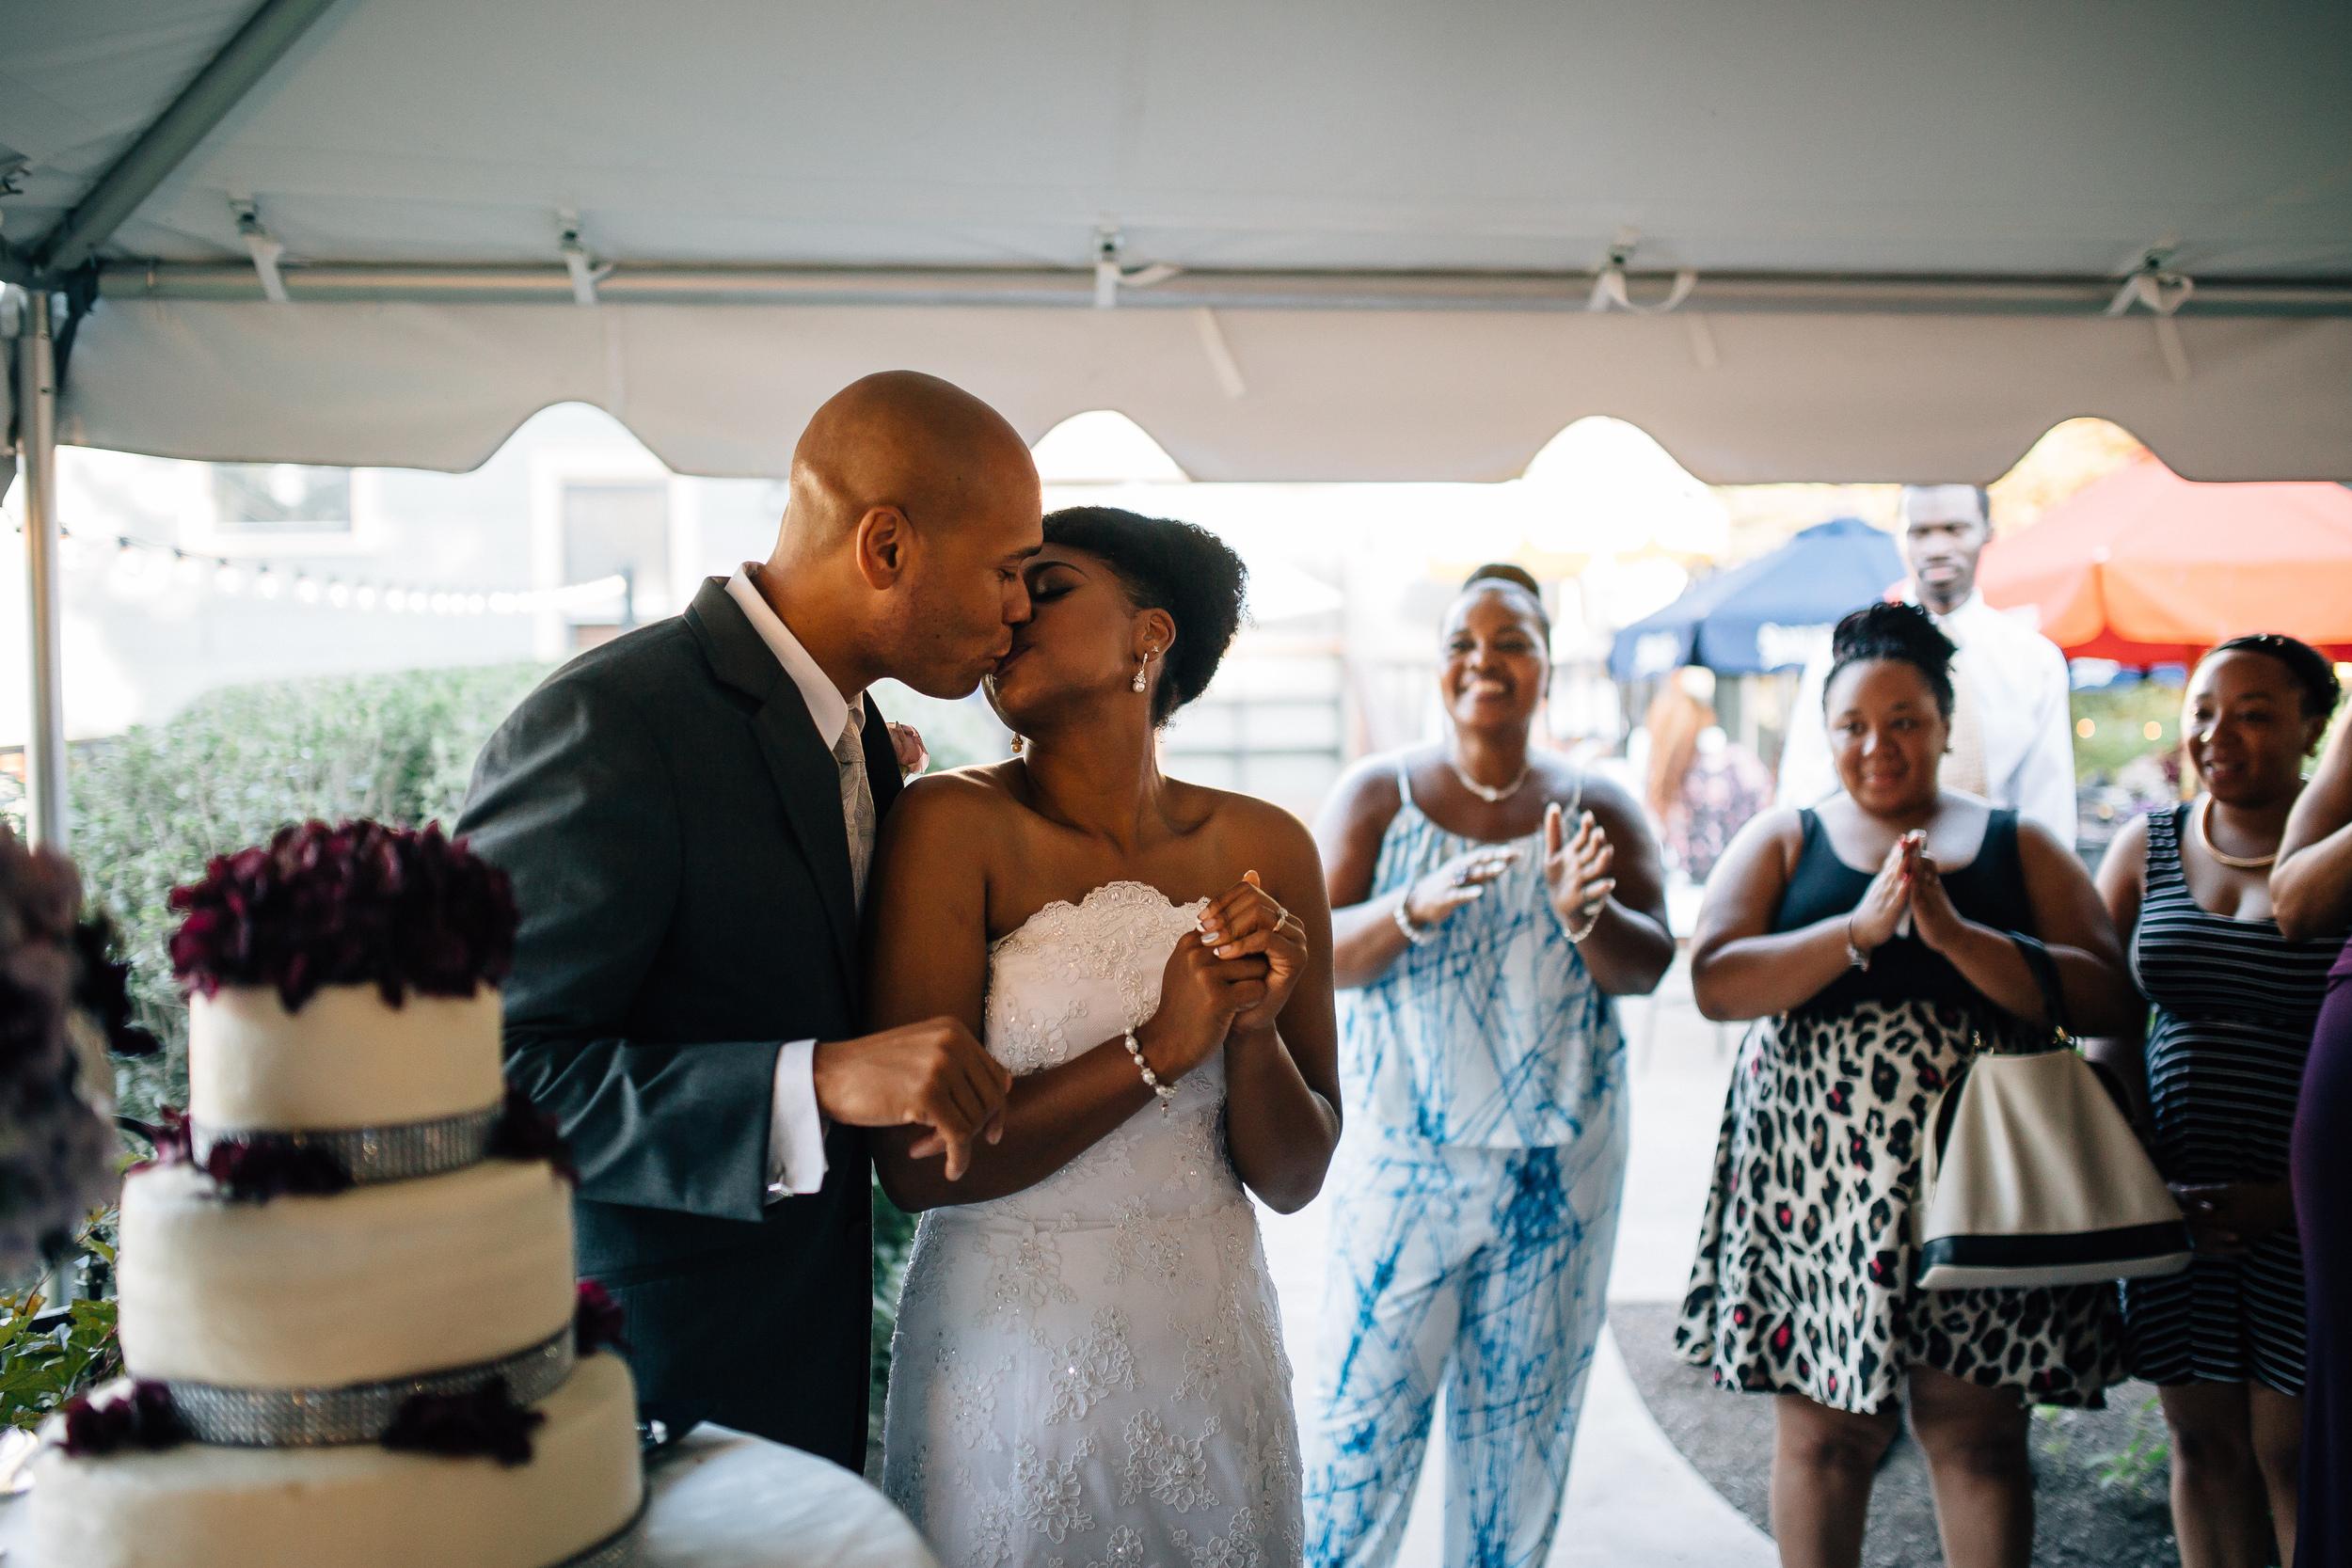 Chuck & Alicia's Wedding - Corrie Mick Photography-546.jpg